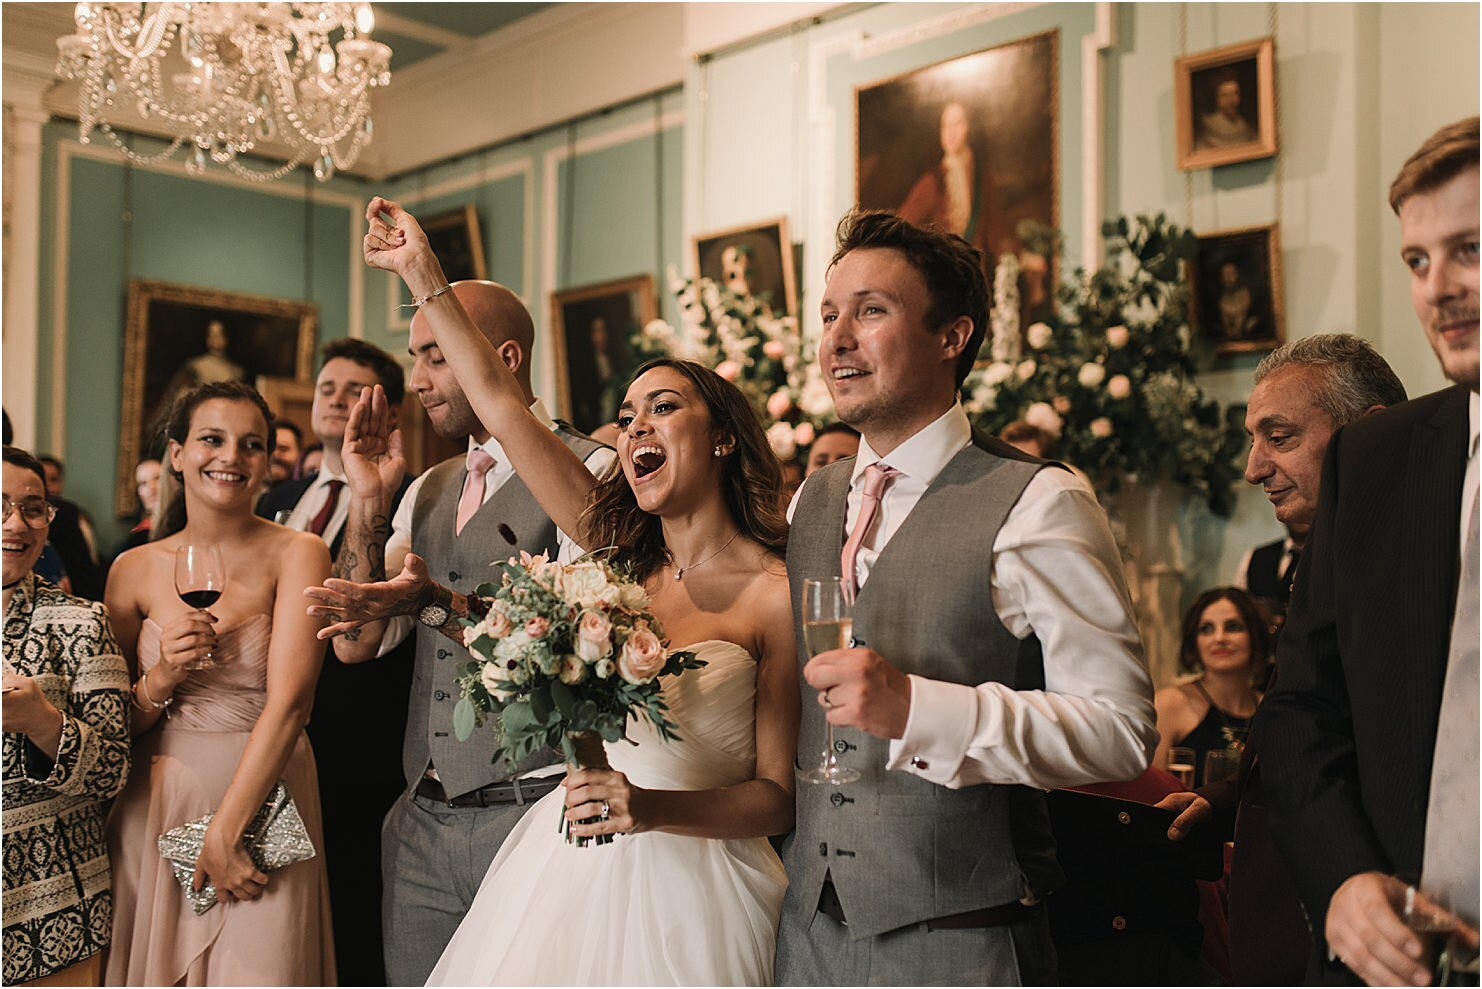 boda-de-cuento-en-castillo-boda-en-londres-78.jpg